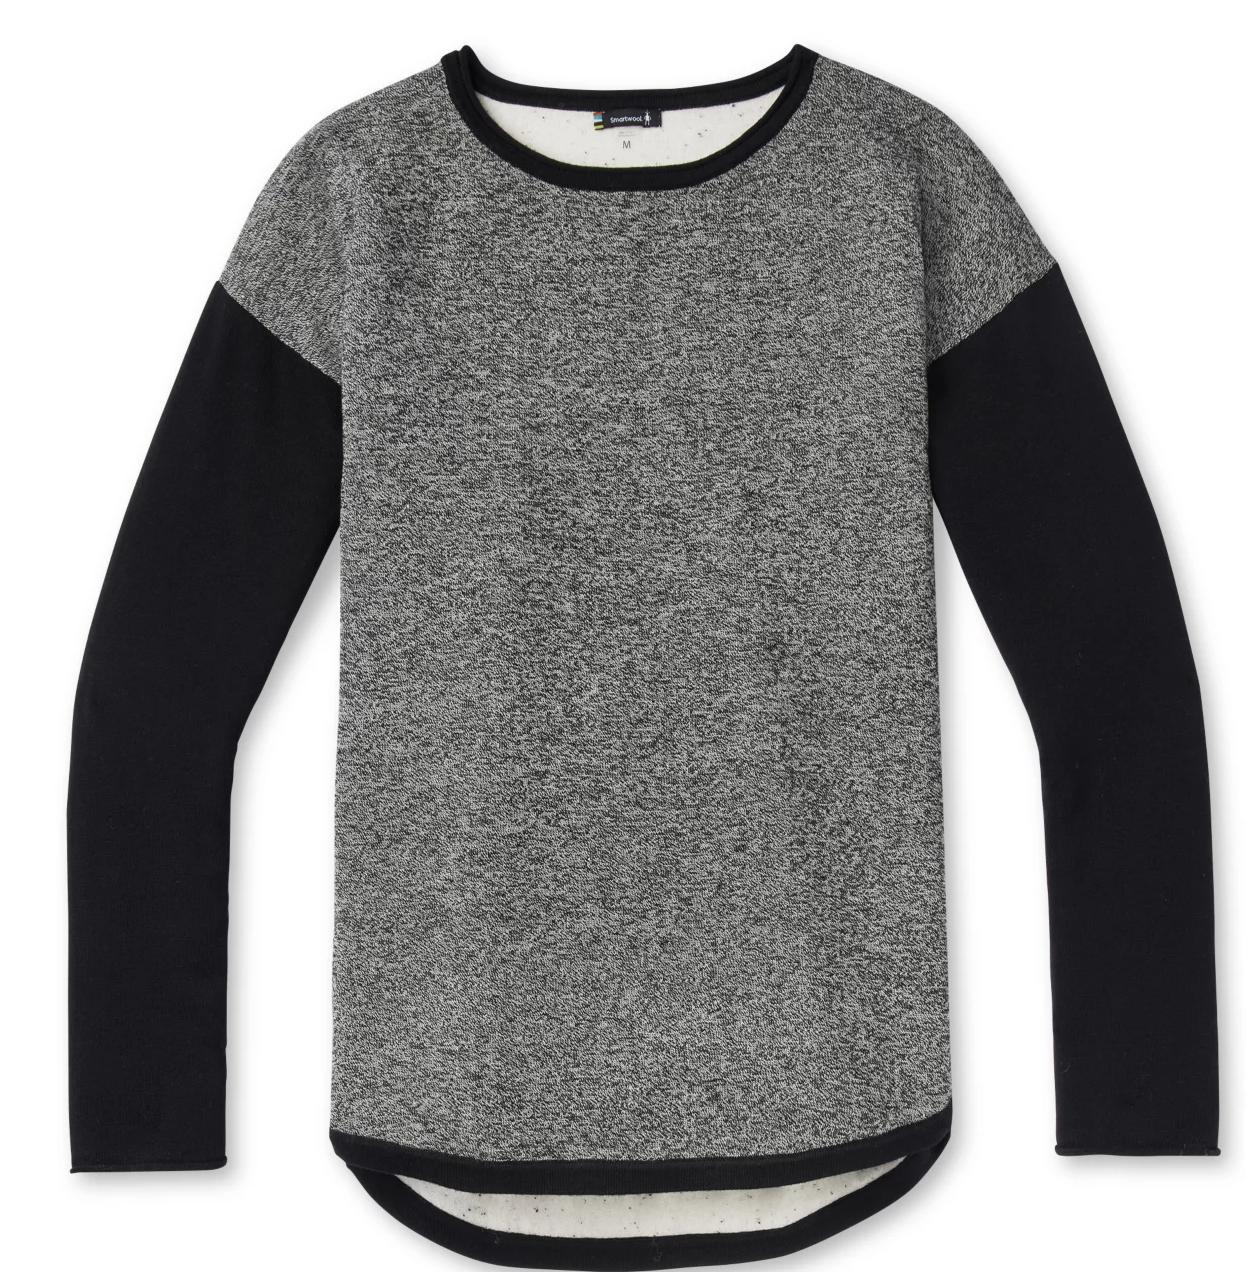 Smartwool Shadow Pine Colorblock Sweater Women's